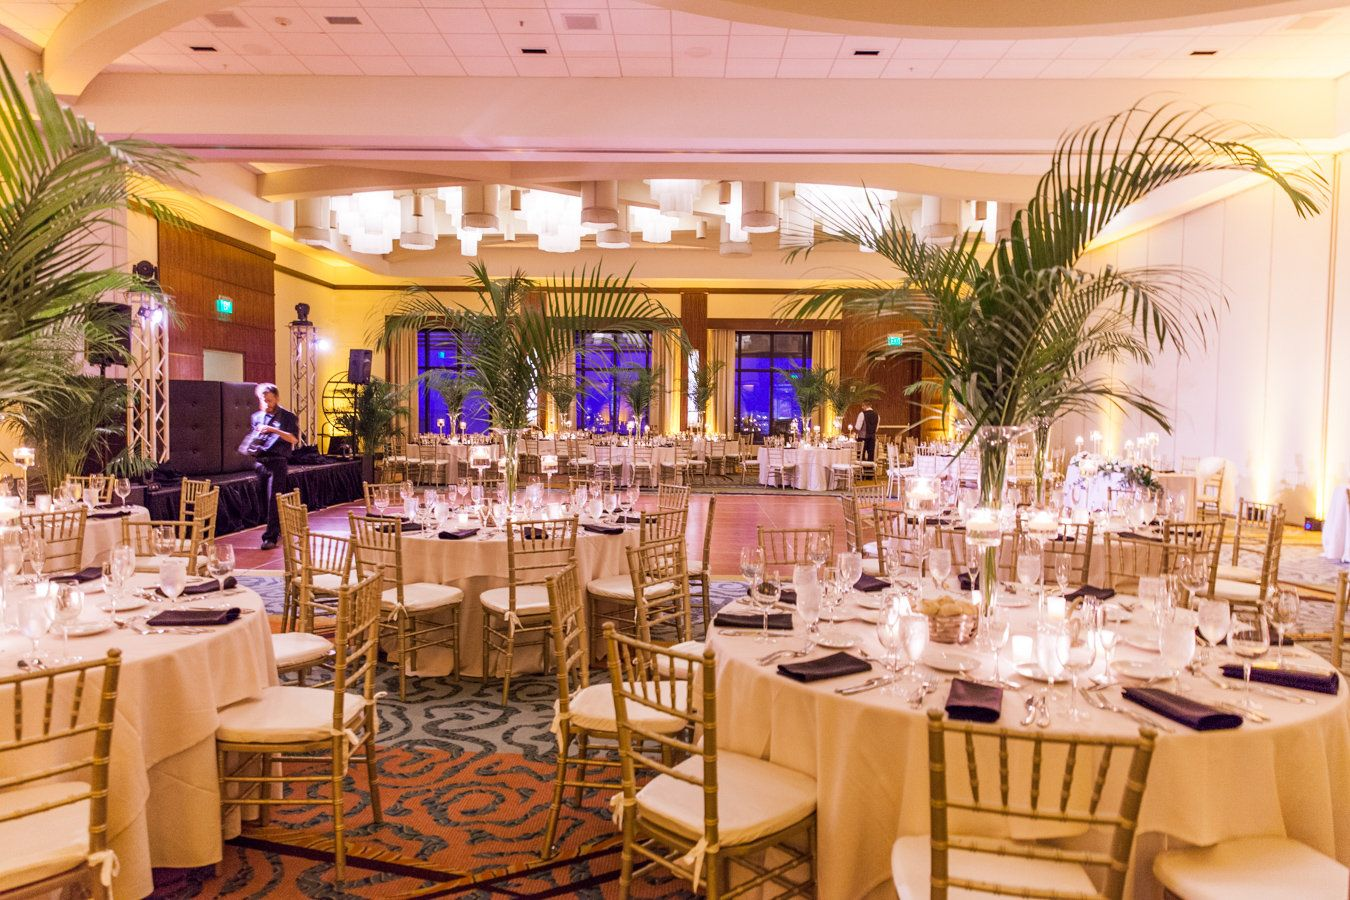 Fort Lauderdale Marriott Harbor Beach Resort Wedding Reception Setup Florida Wedding Dj Photo Credi Wedding Dj Setup Wedding Dj Wedding Planner Printables